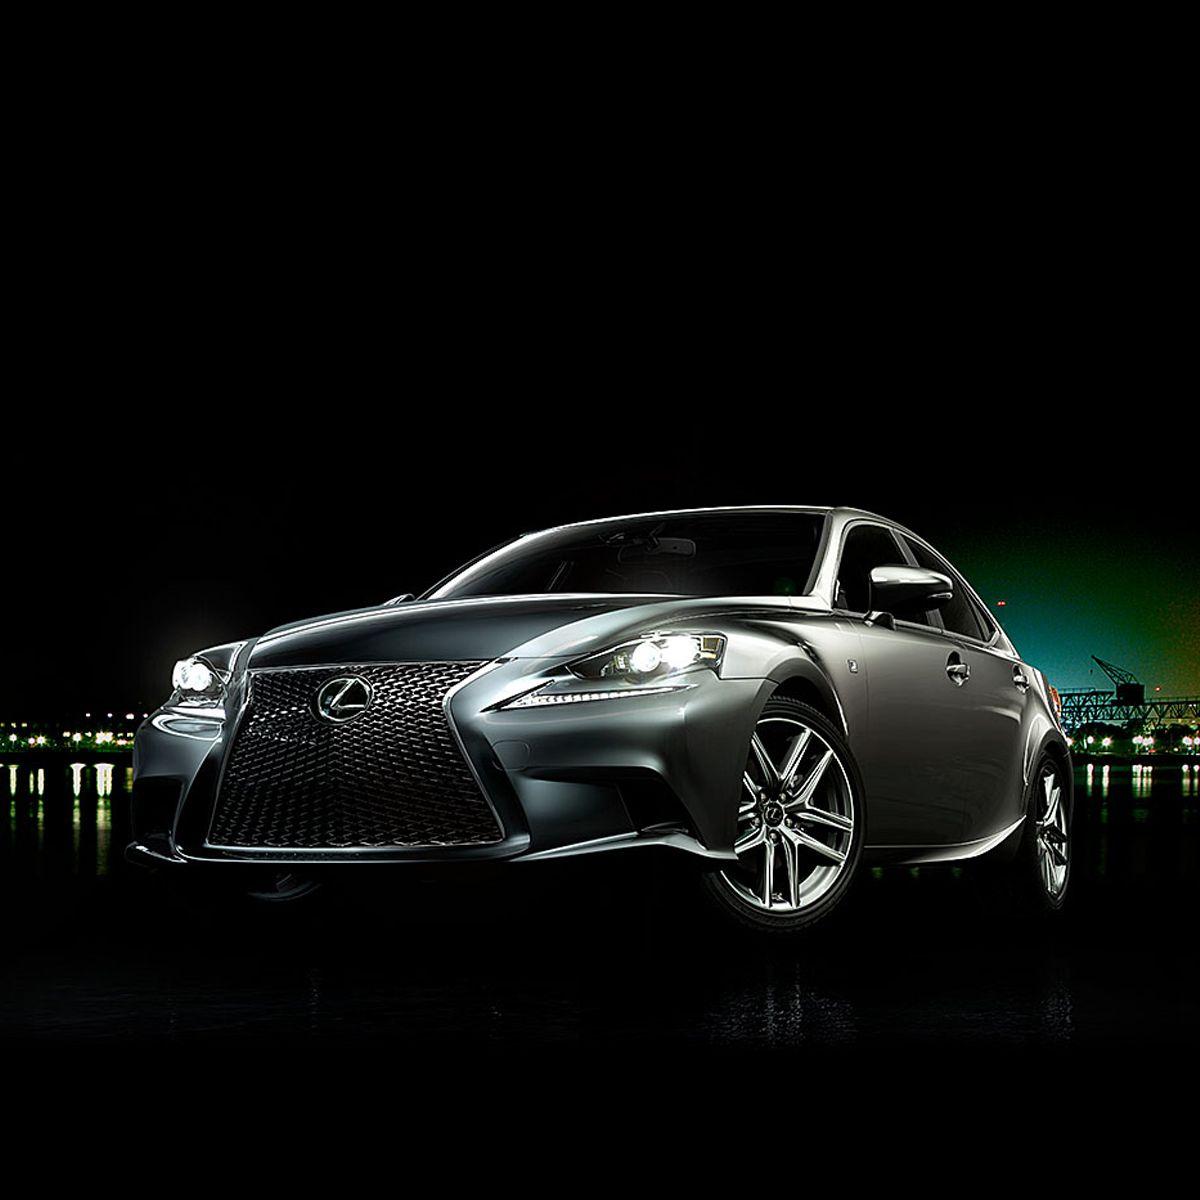 Lexus IS F Sport Lexus sports car, New lexus, Lexus models